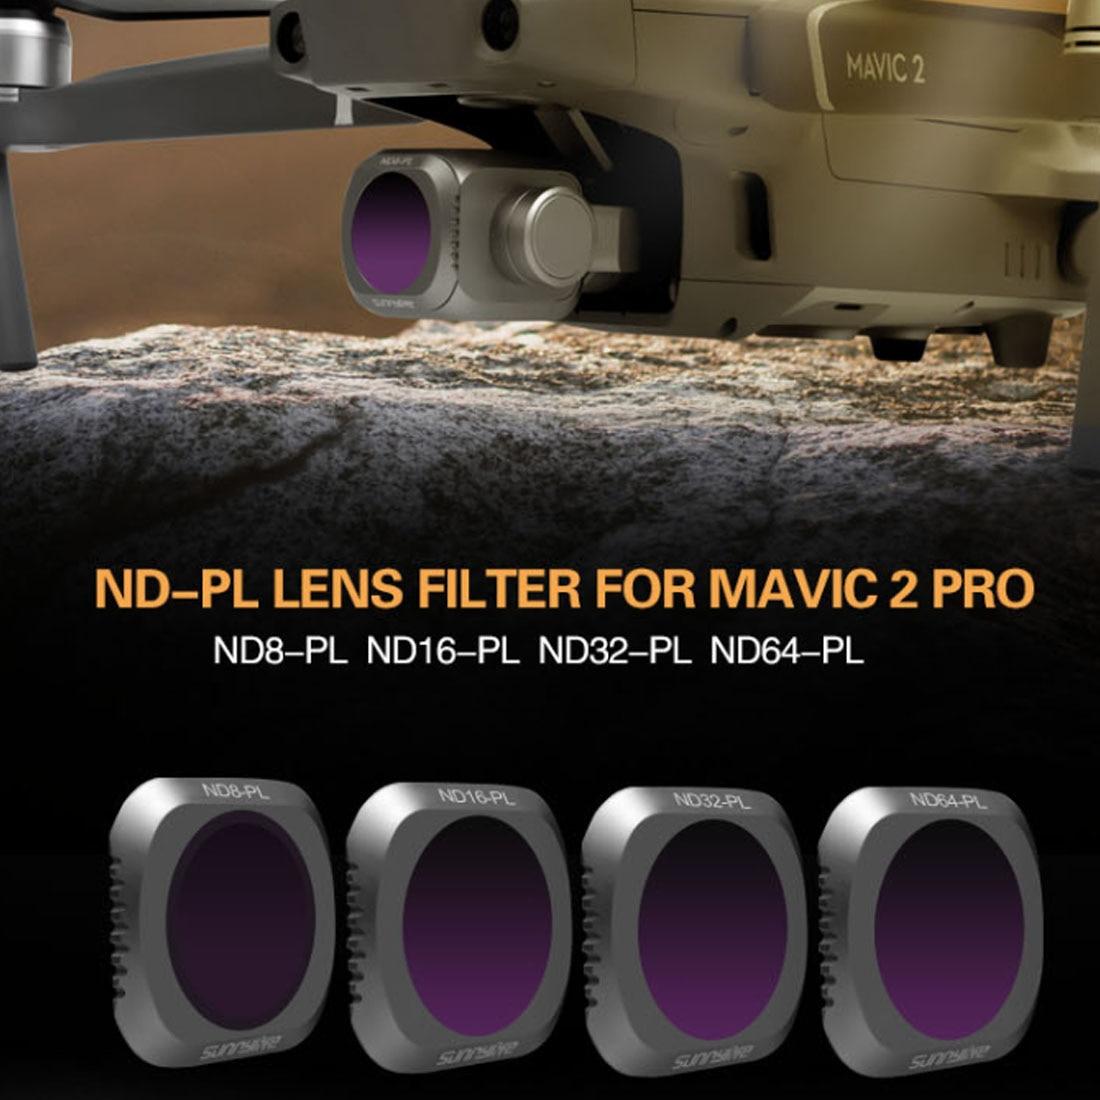 Sunnylife 4 pz Set di Filtri con ND8-PL ND16-PL ND32-PL ND64-PL Filtro per DJI MAVIC 2 PRO Drone